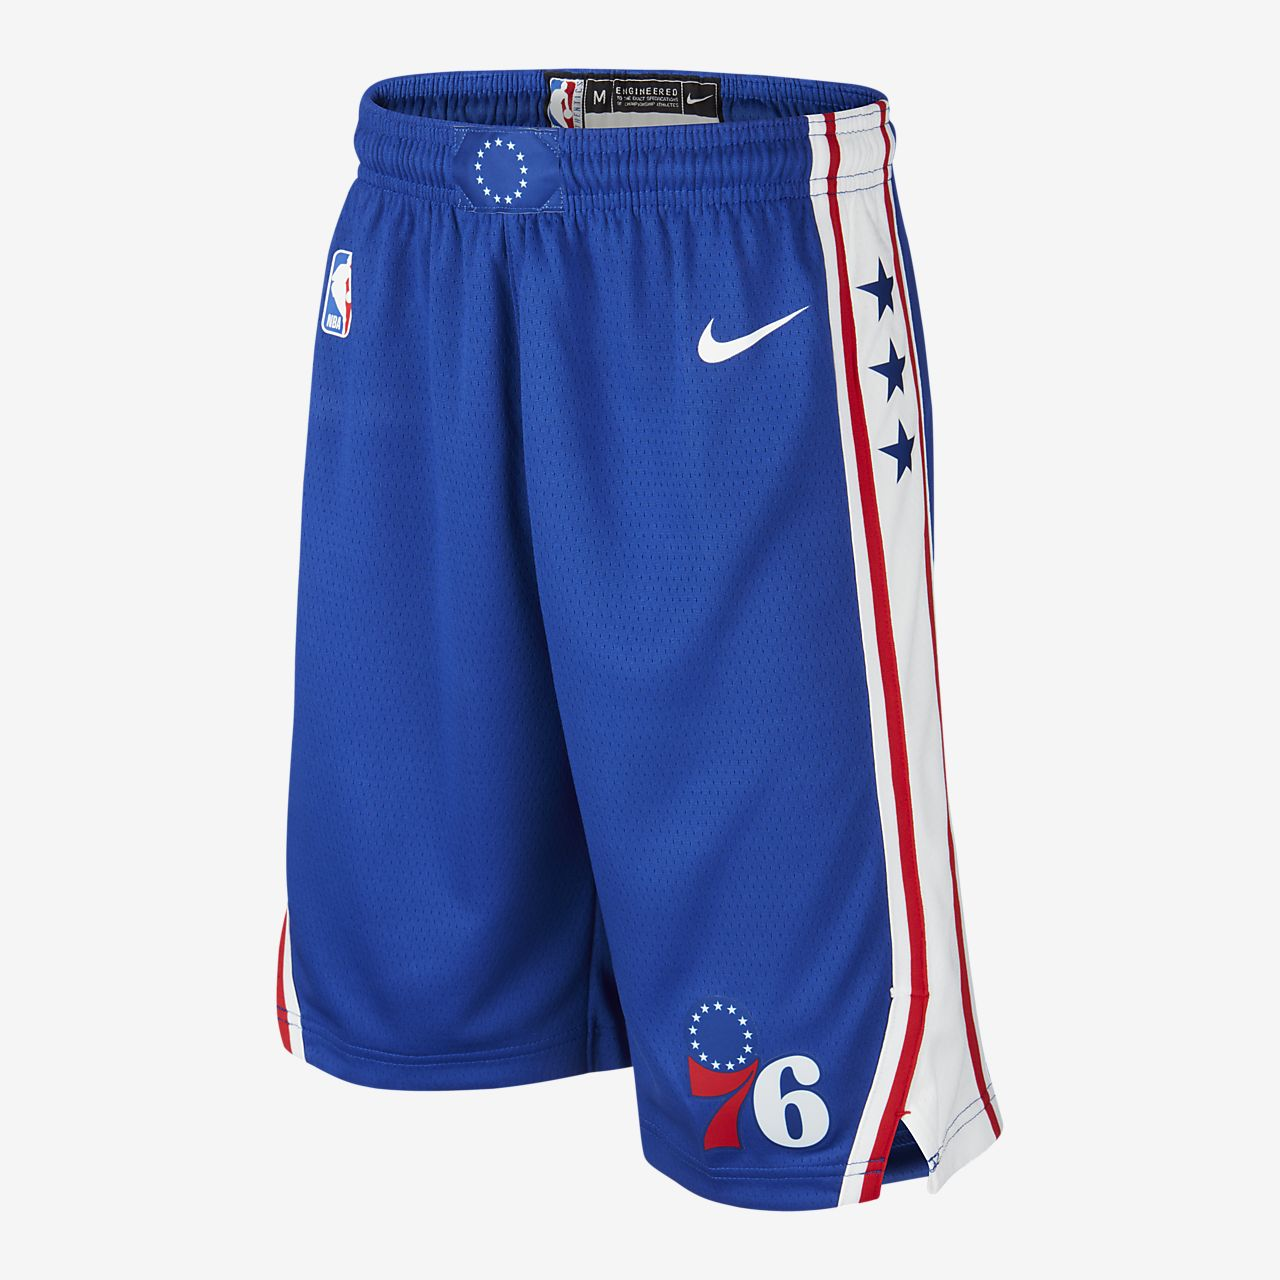 76ers Icon Edition Older Kids' Nike NBA Swingman Shorts